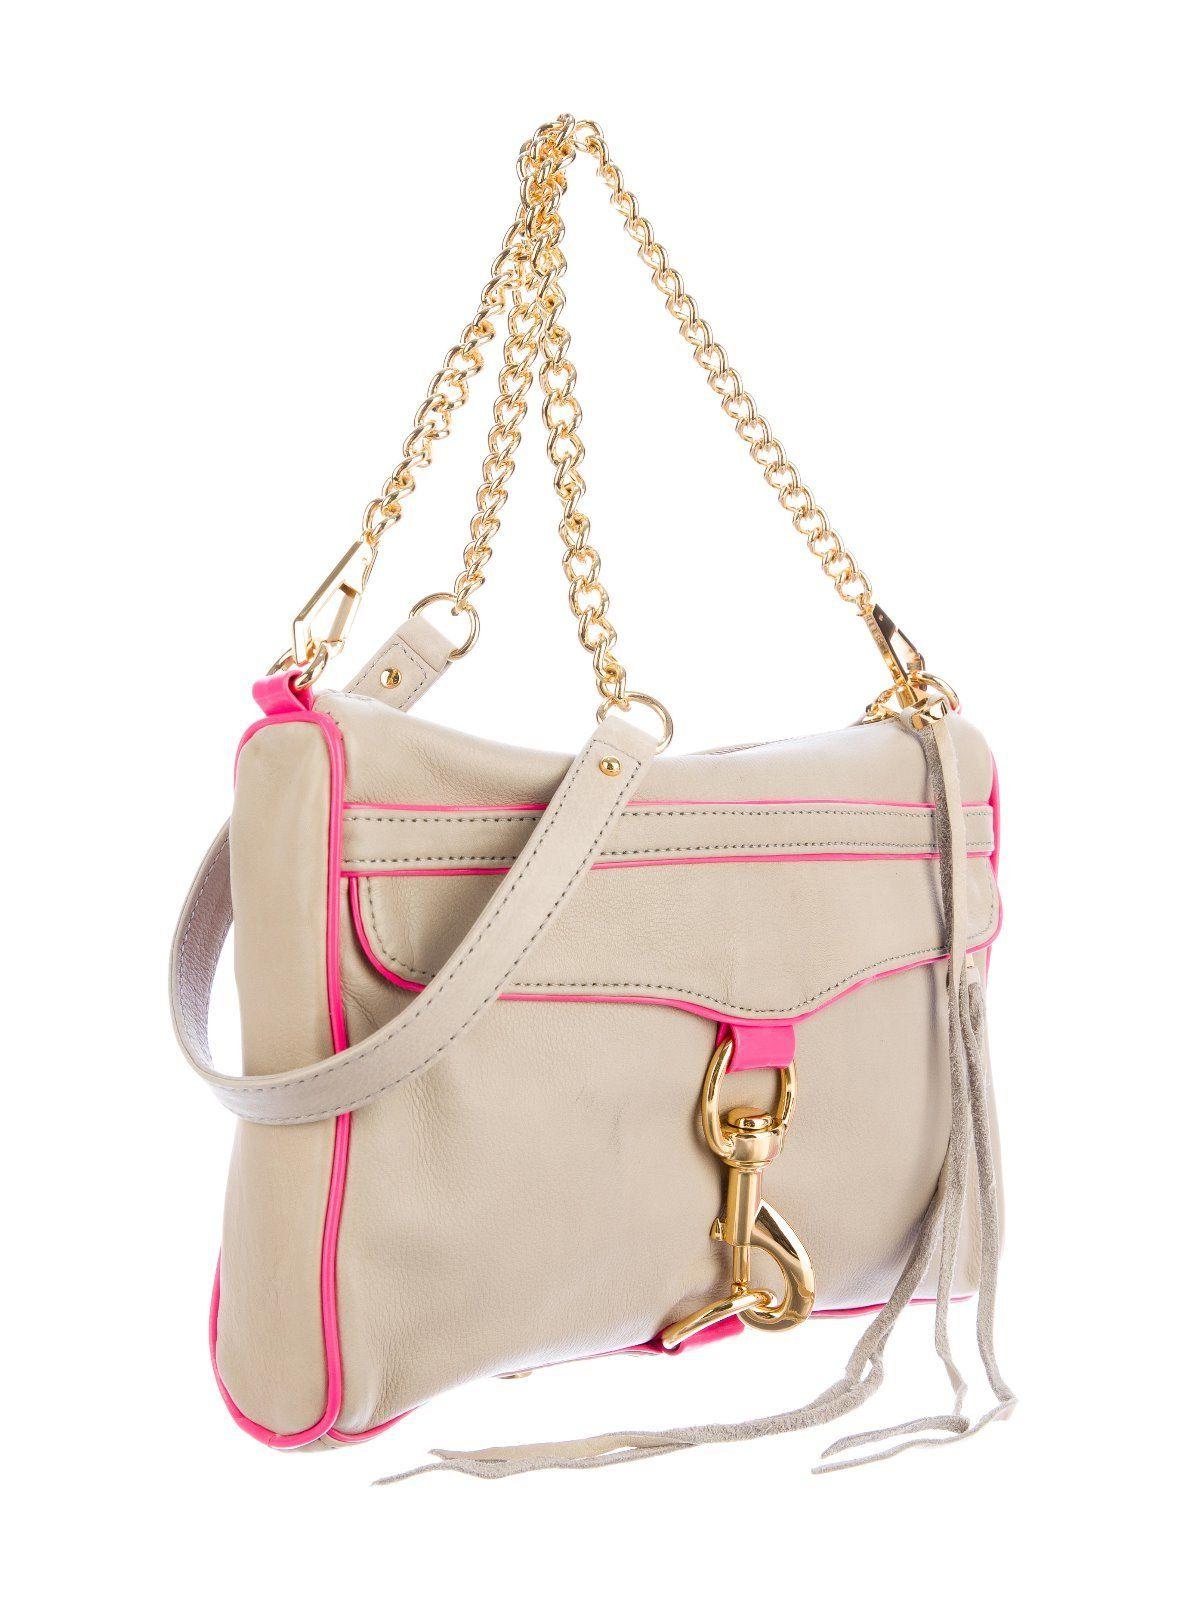 rebecca minkoff crossbody tumi crossbody bag cute crossbody bags